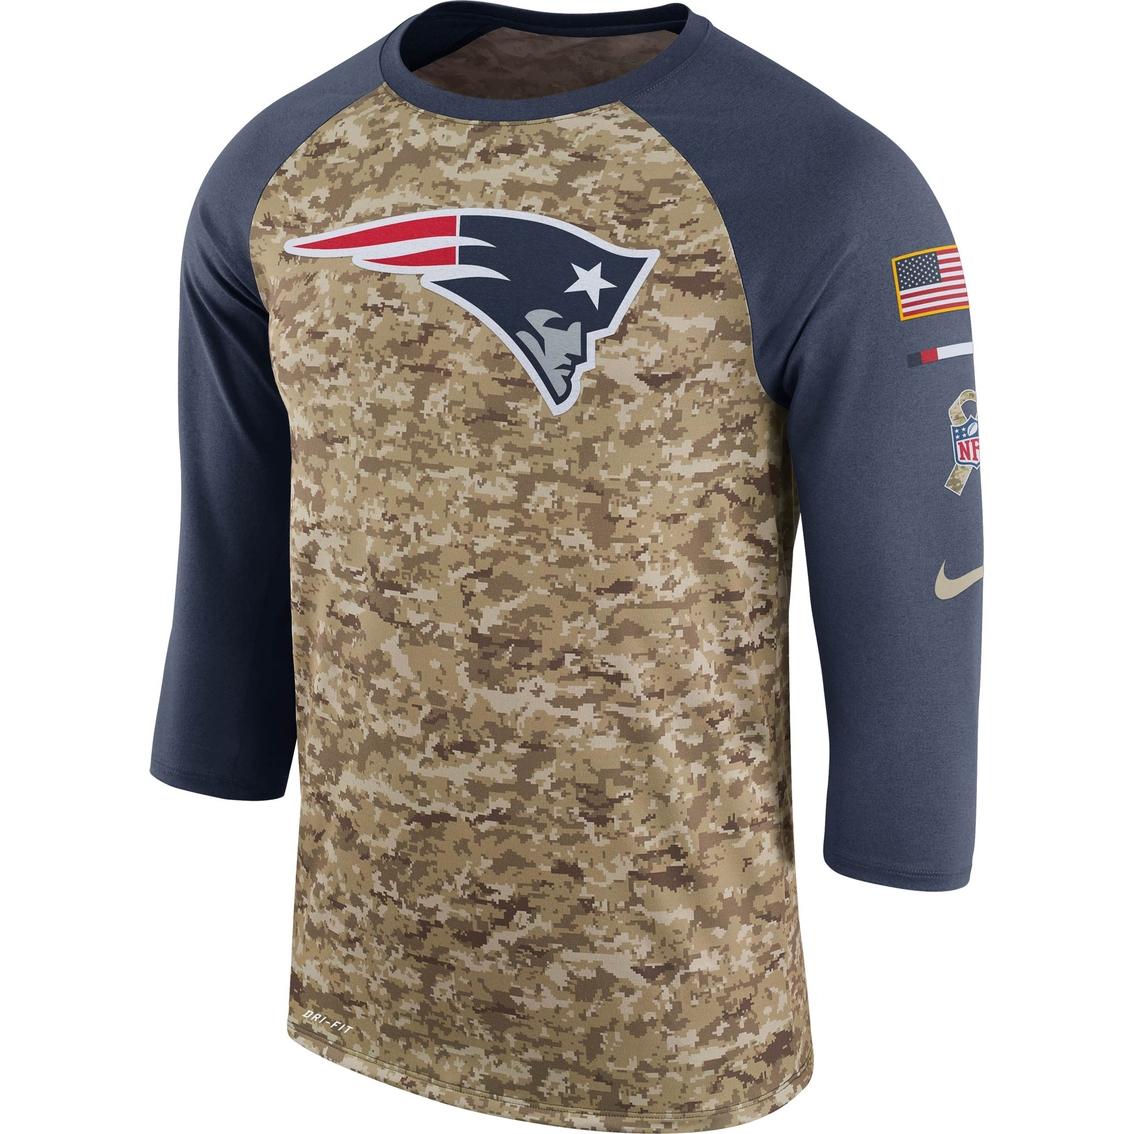 9cc9fae3 Nike Nfl New England Patriots Salute To Service Raglan Tee | Shirts ...